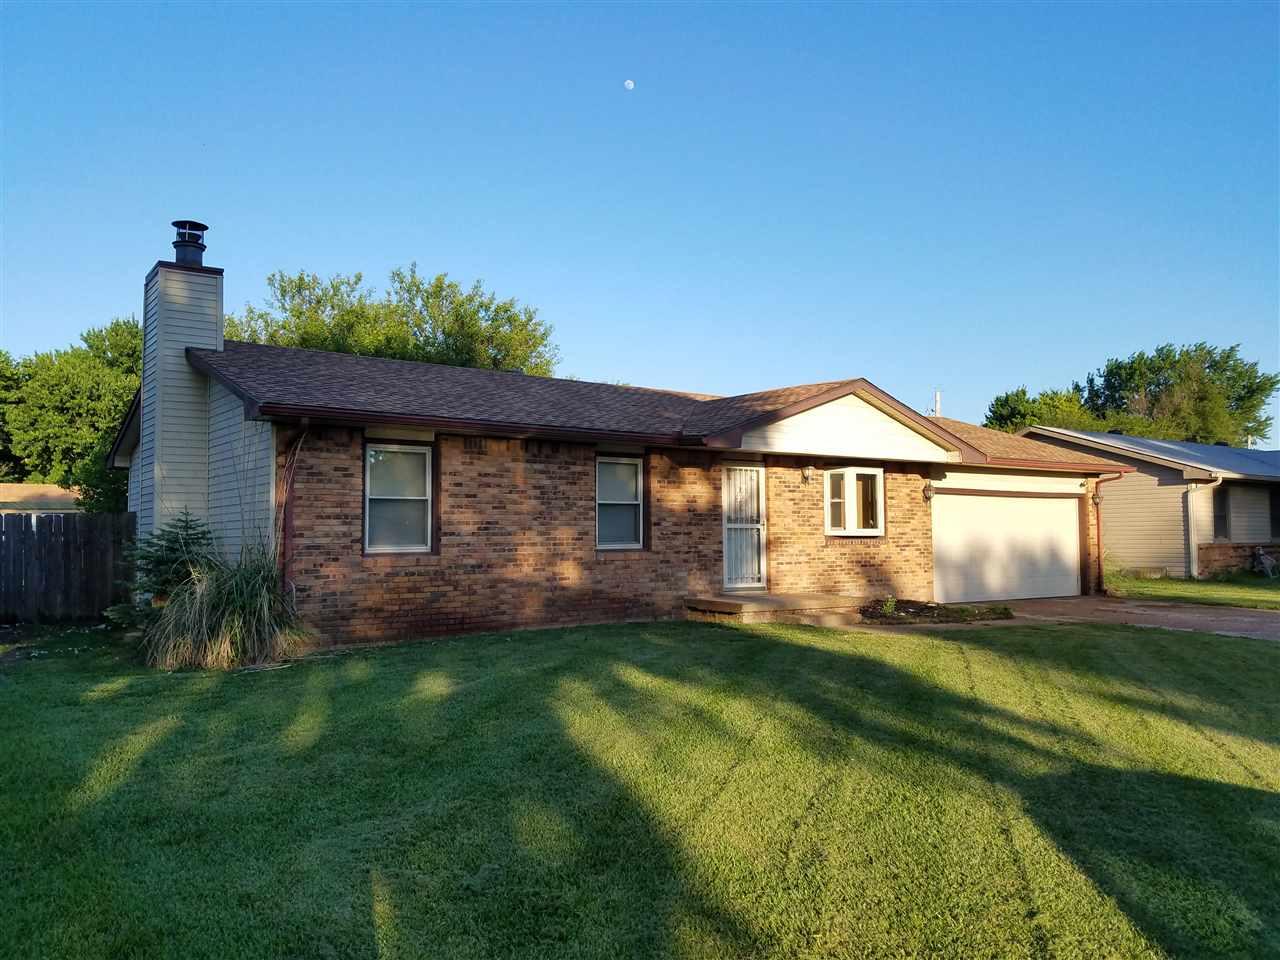 3010 S CUSTER AVE, Wichita, KS 67217